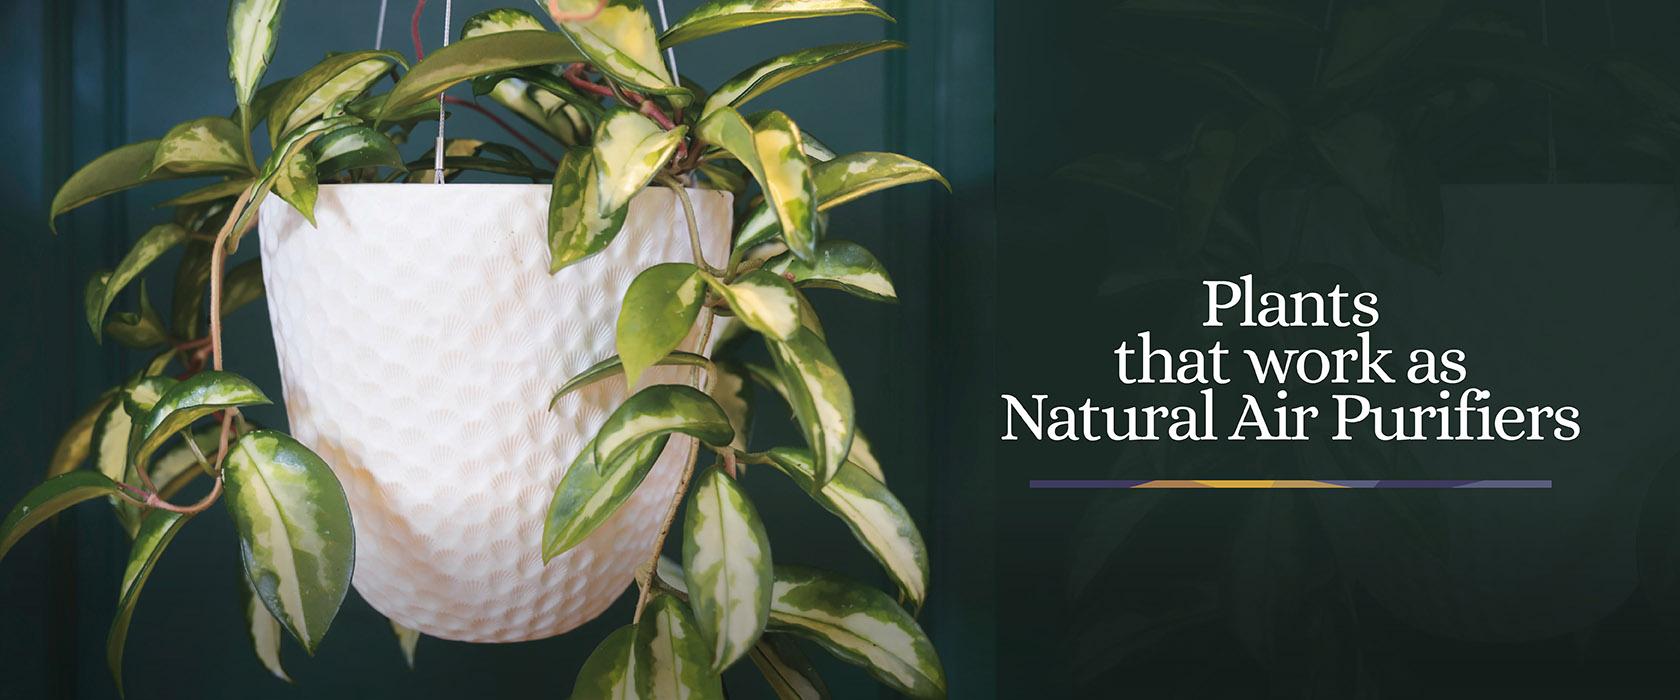 Indoor-Plants-Air-Purifiers-Blog-Header